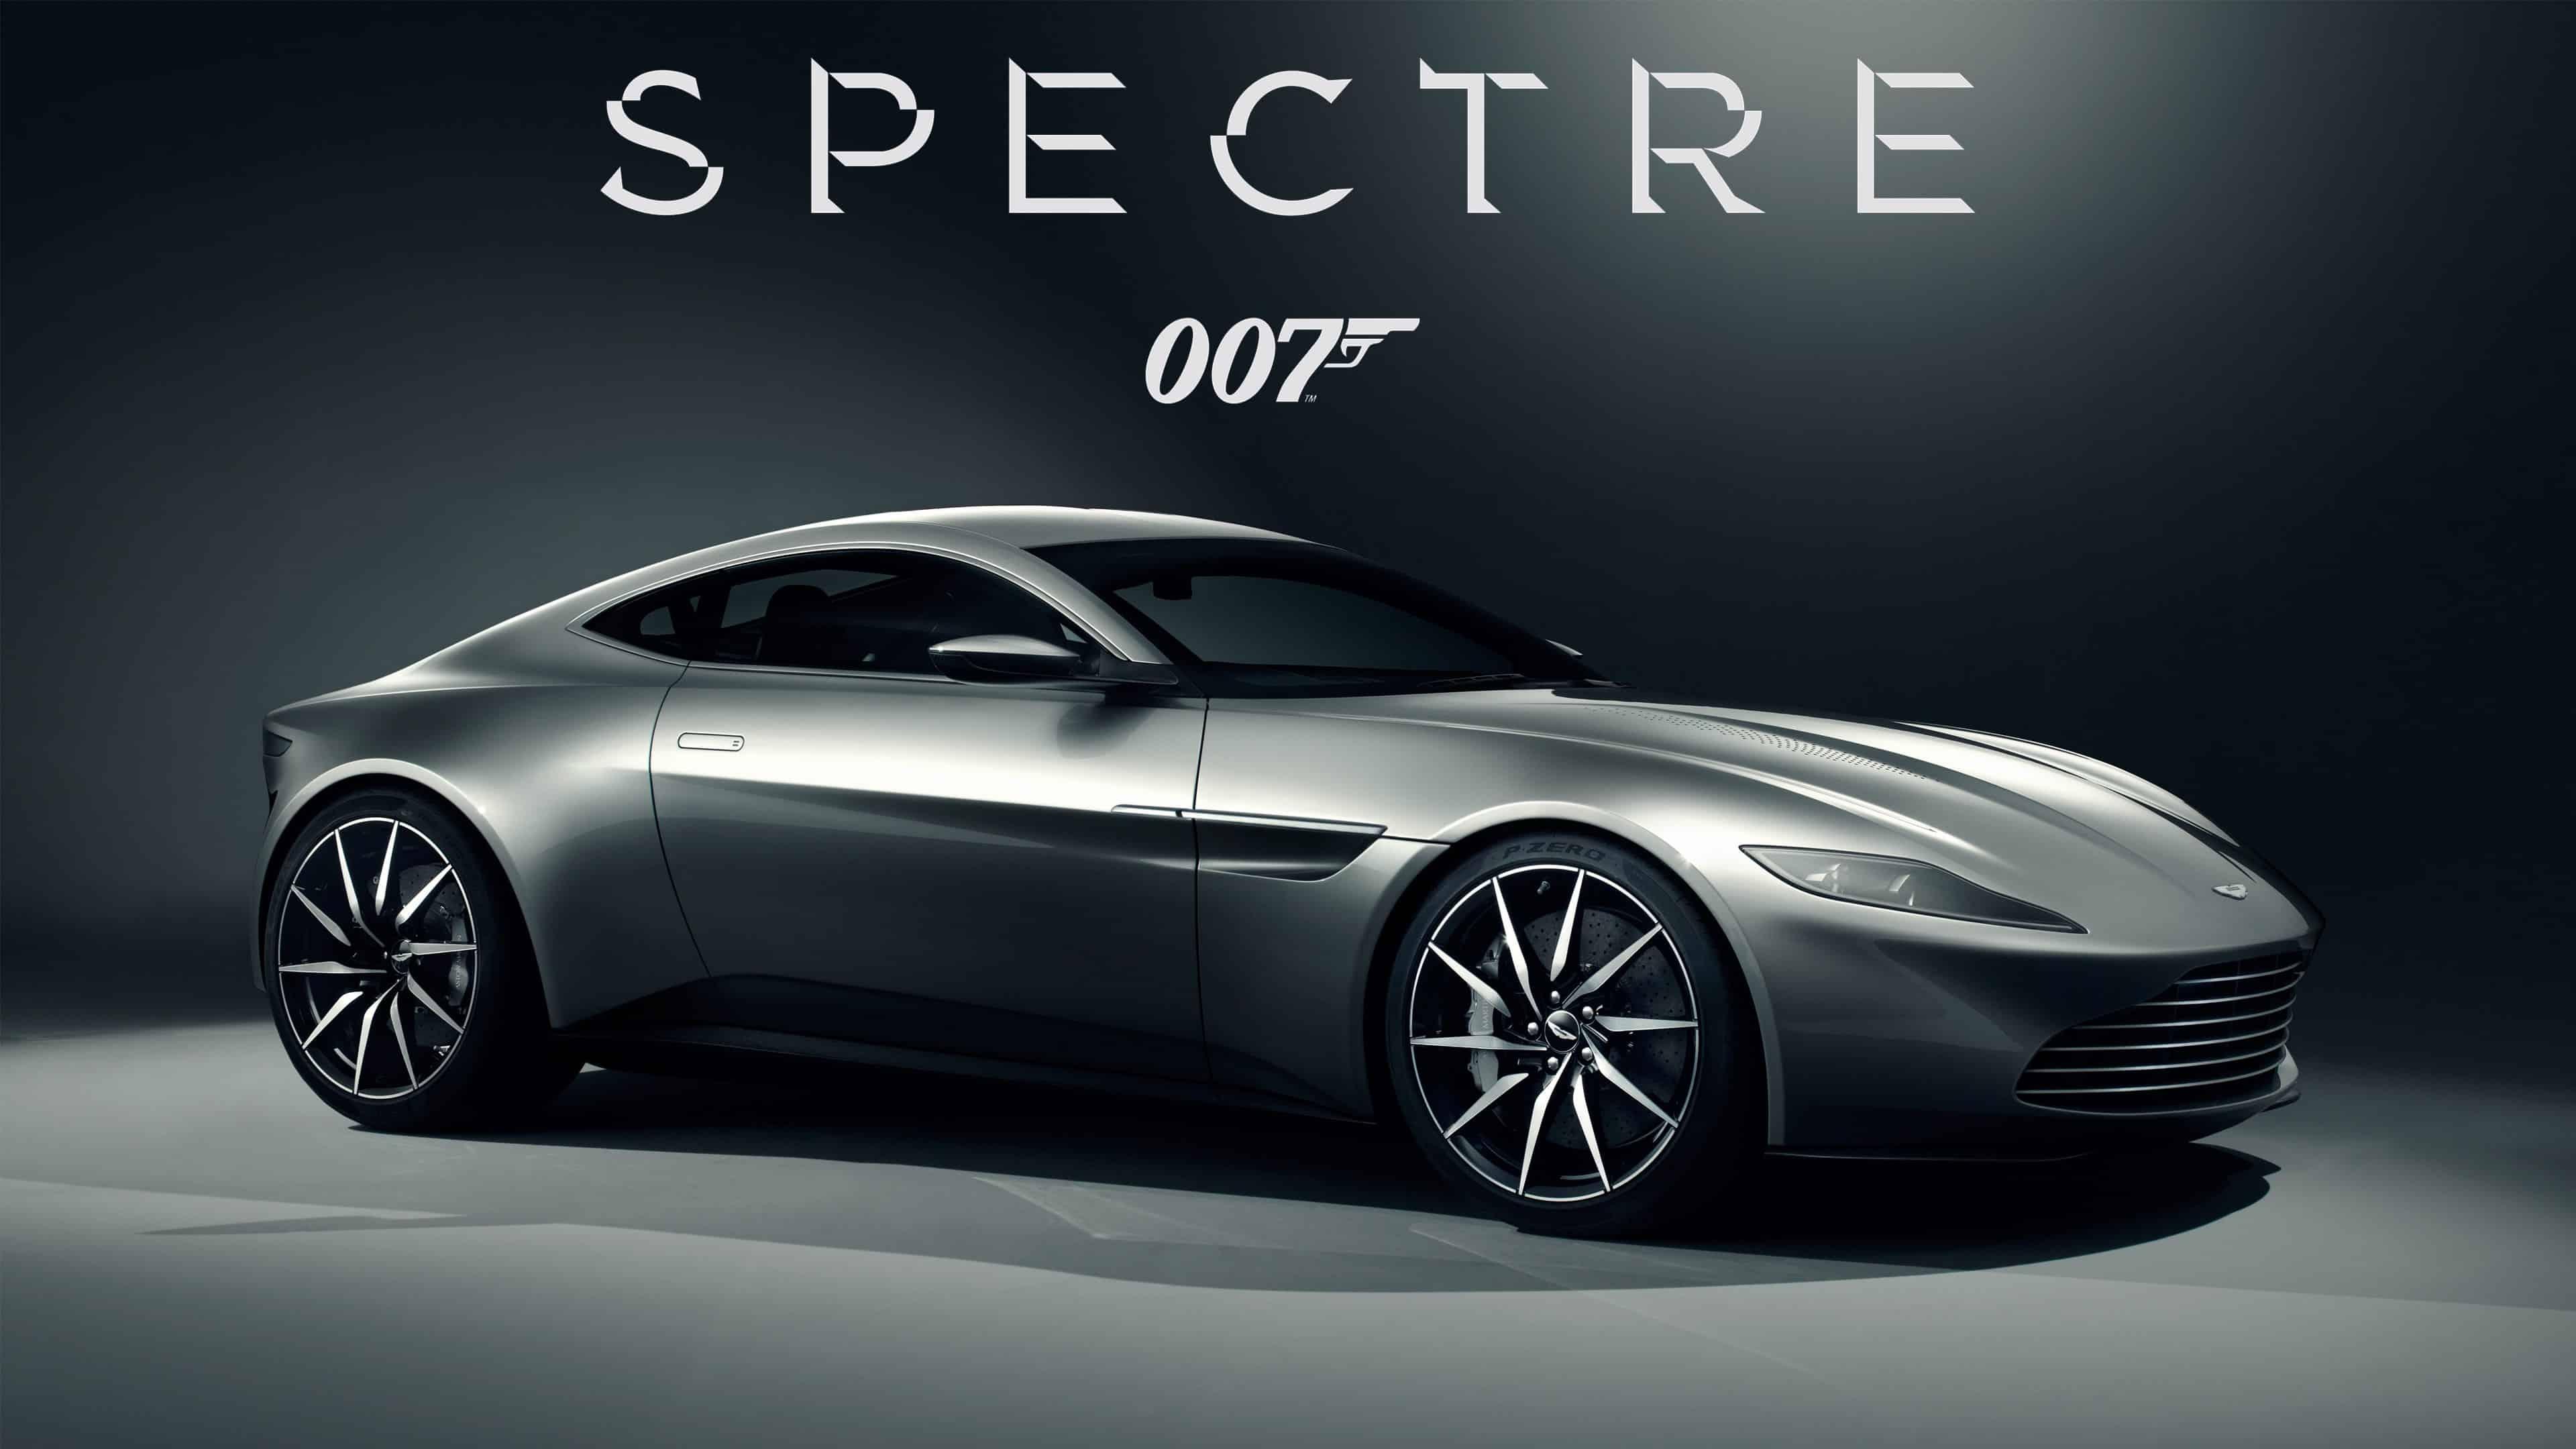 Daniel craig, james bond, skyfall, aston martin, 007, movies, vehicle, car, suits   1920x1080 wallpaper James Bond Cars Wallpapers Wallpaper Cave